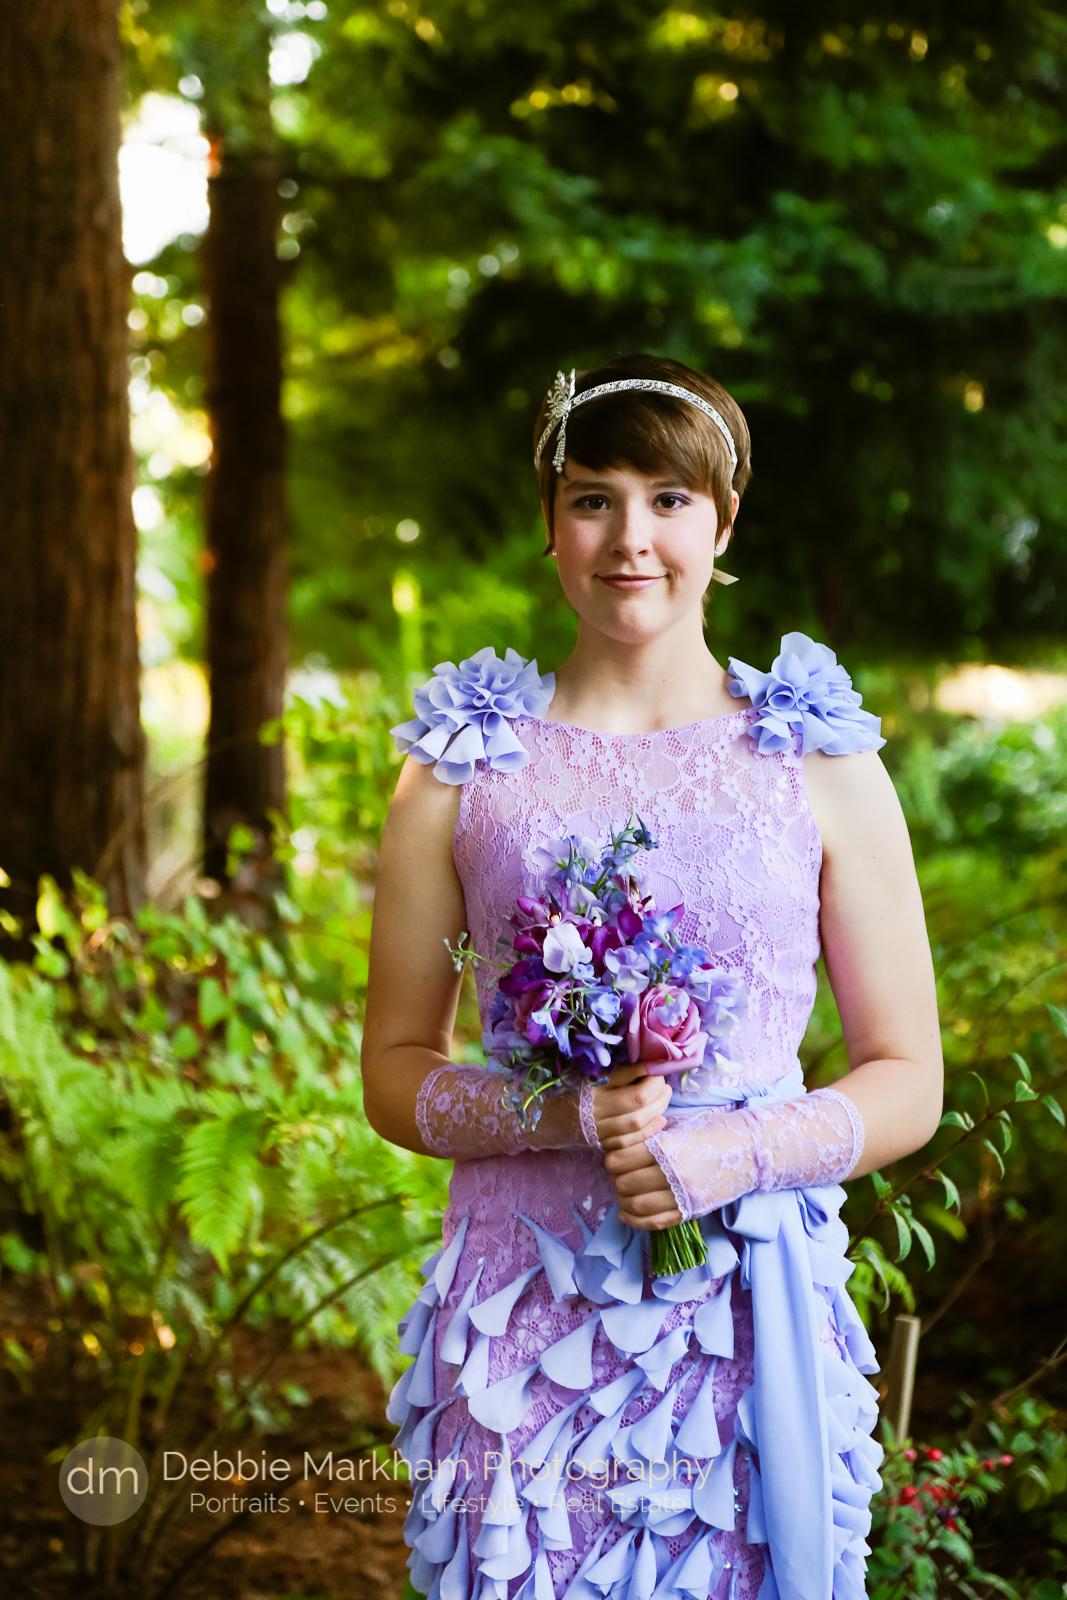 Debbie Markham Photography_Wedding Photographer_Cambria Pines Lodge_Same Sex Wedding_LGBT_Destination Wedding-0683